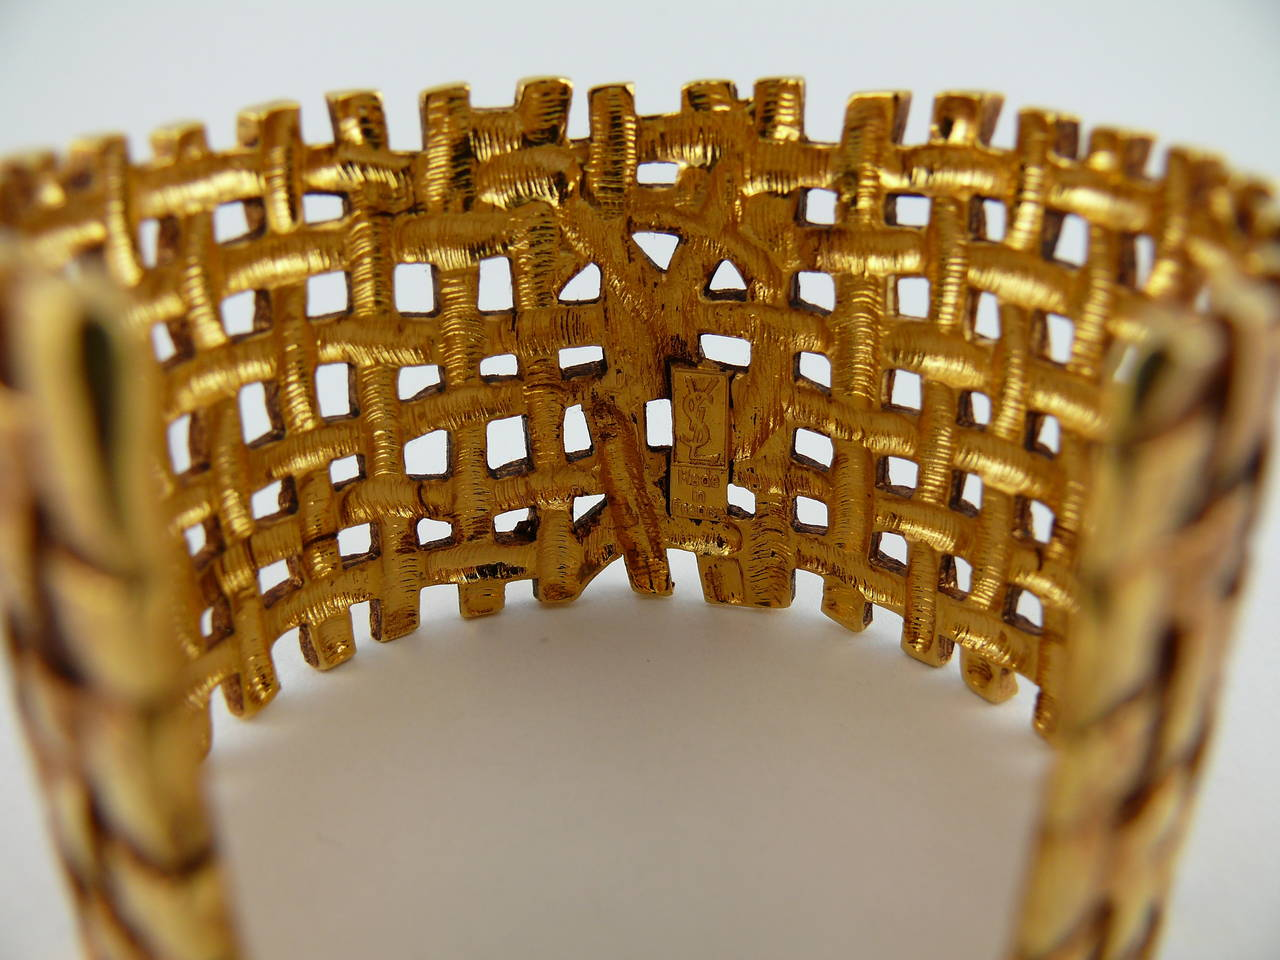 Yves Saint Laurent YSL Vintage Gold Toned Woven Cuff Bracelet For Sale 3